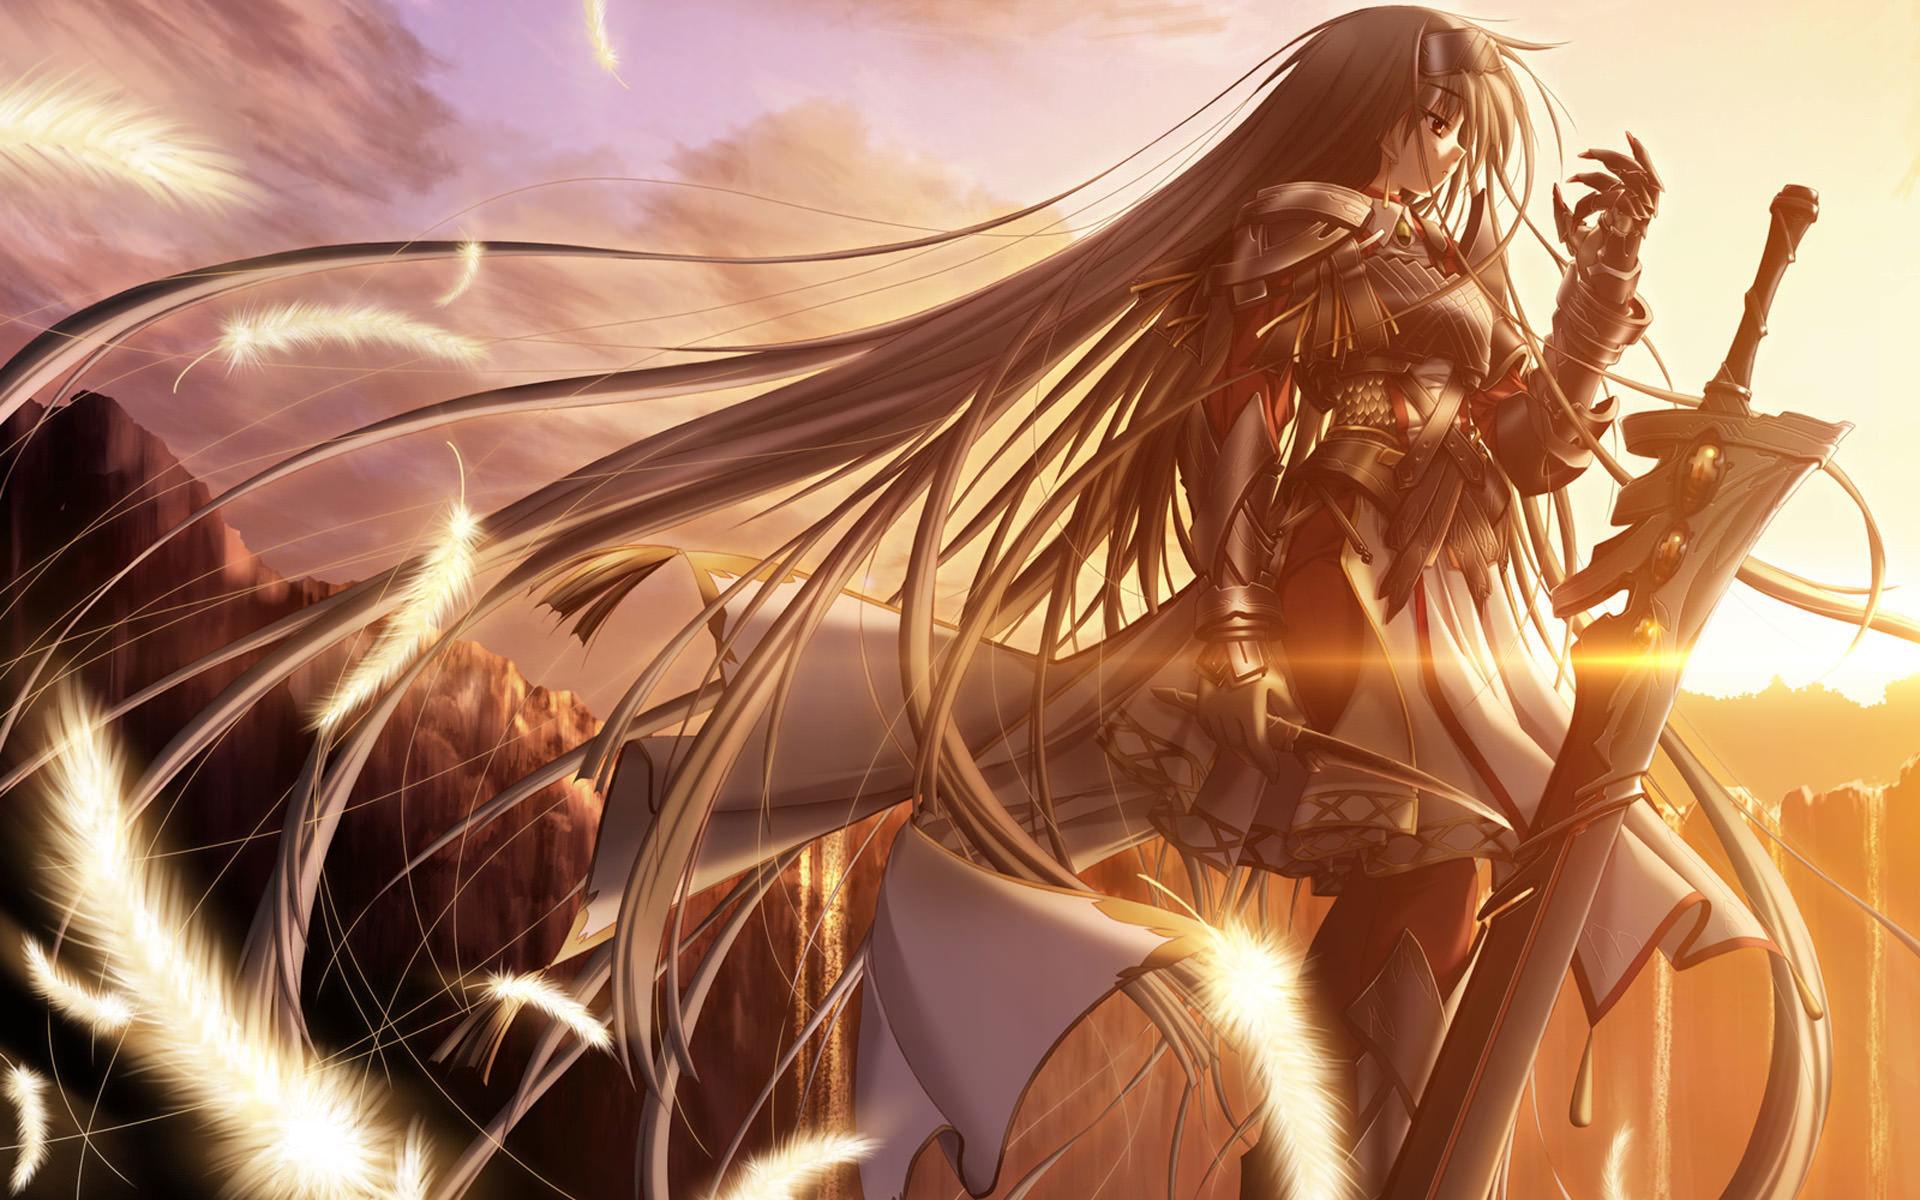 .com/wallpapers/anime-wallpapers/warrior-anime-girl-wallpaper .